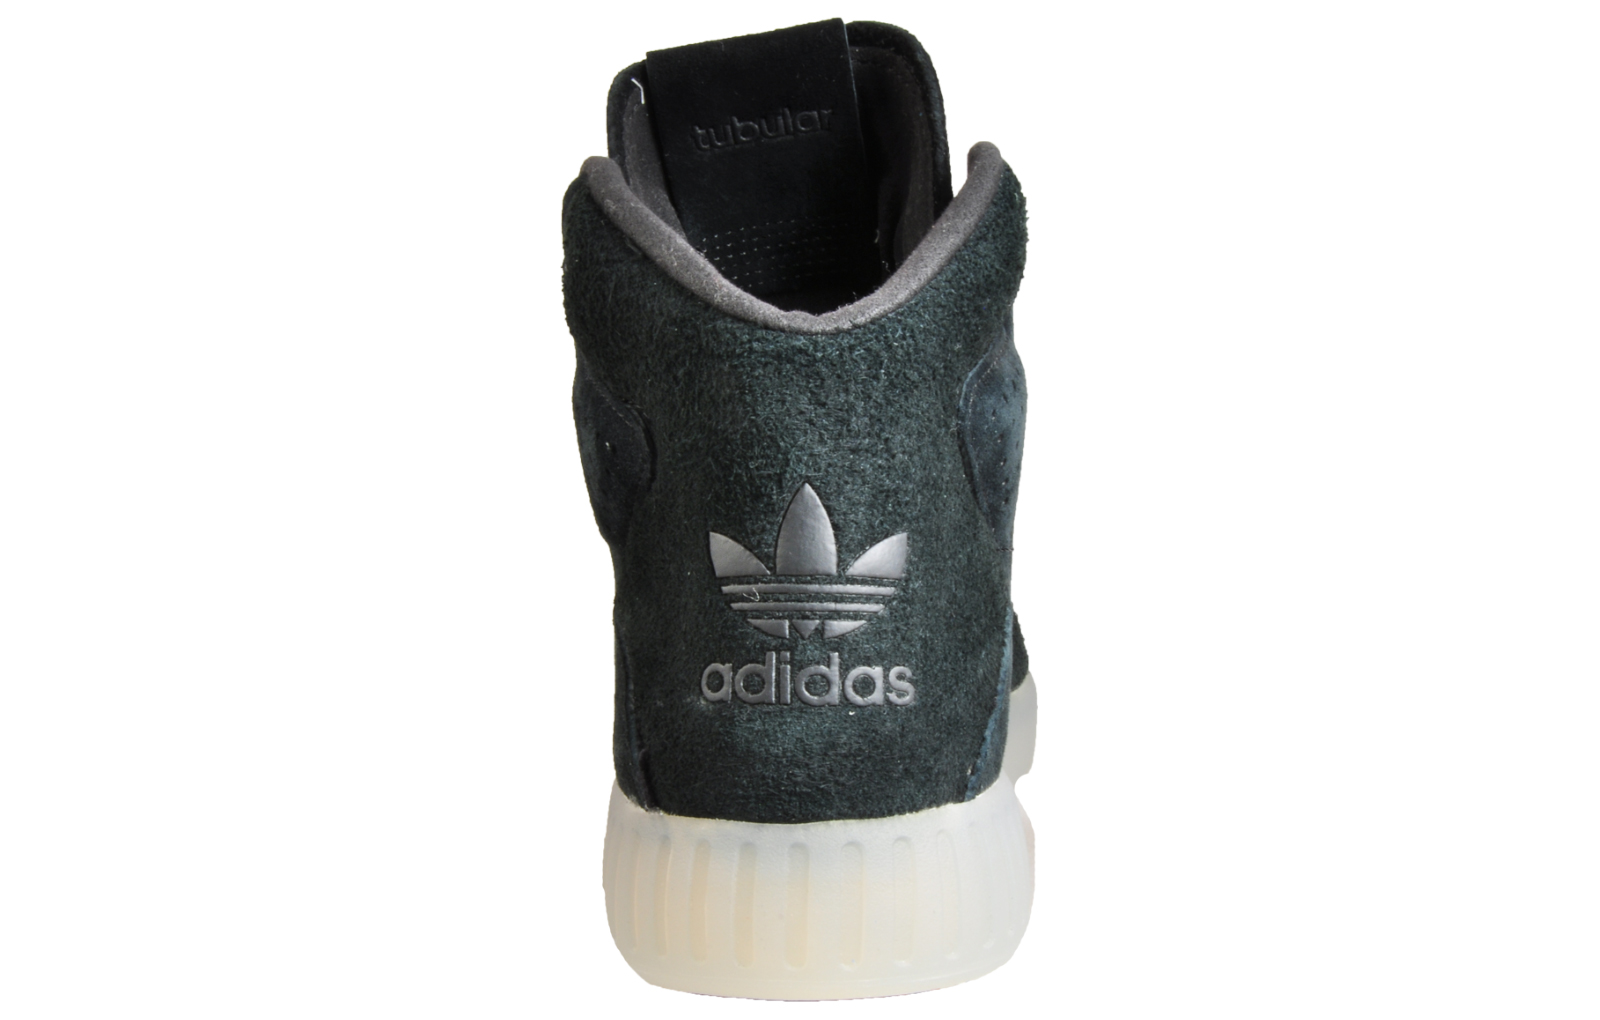 b1f11c9c6d9 Adidas Originals Tubular Invader 2.0 Mens -